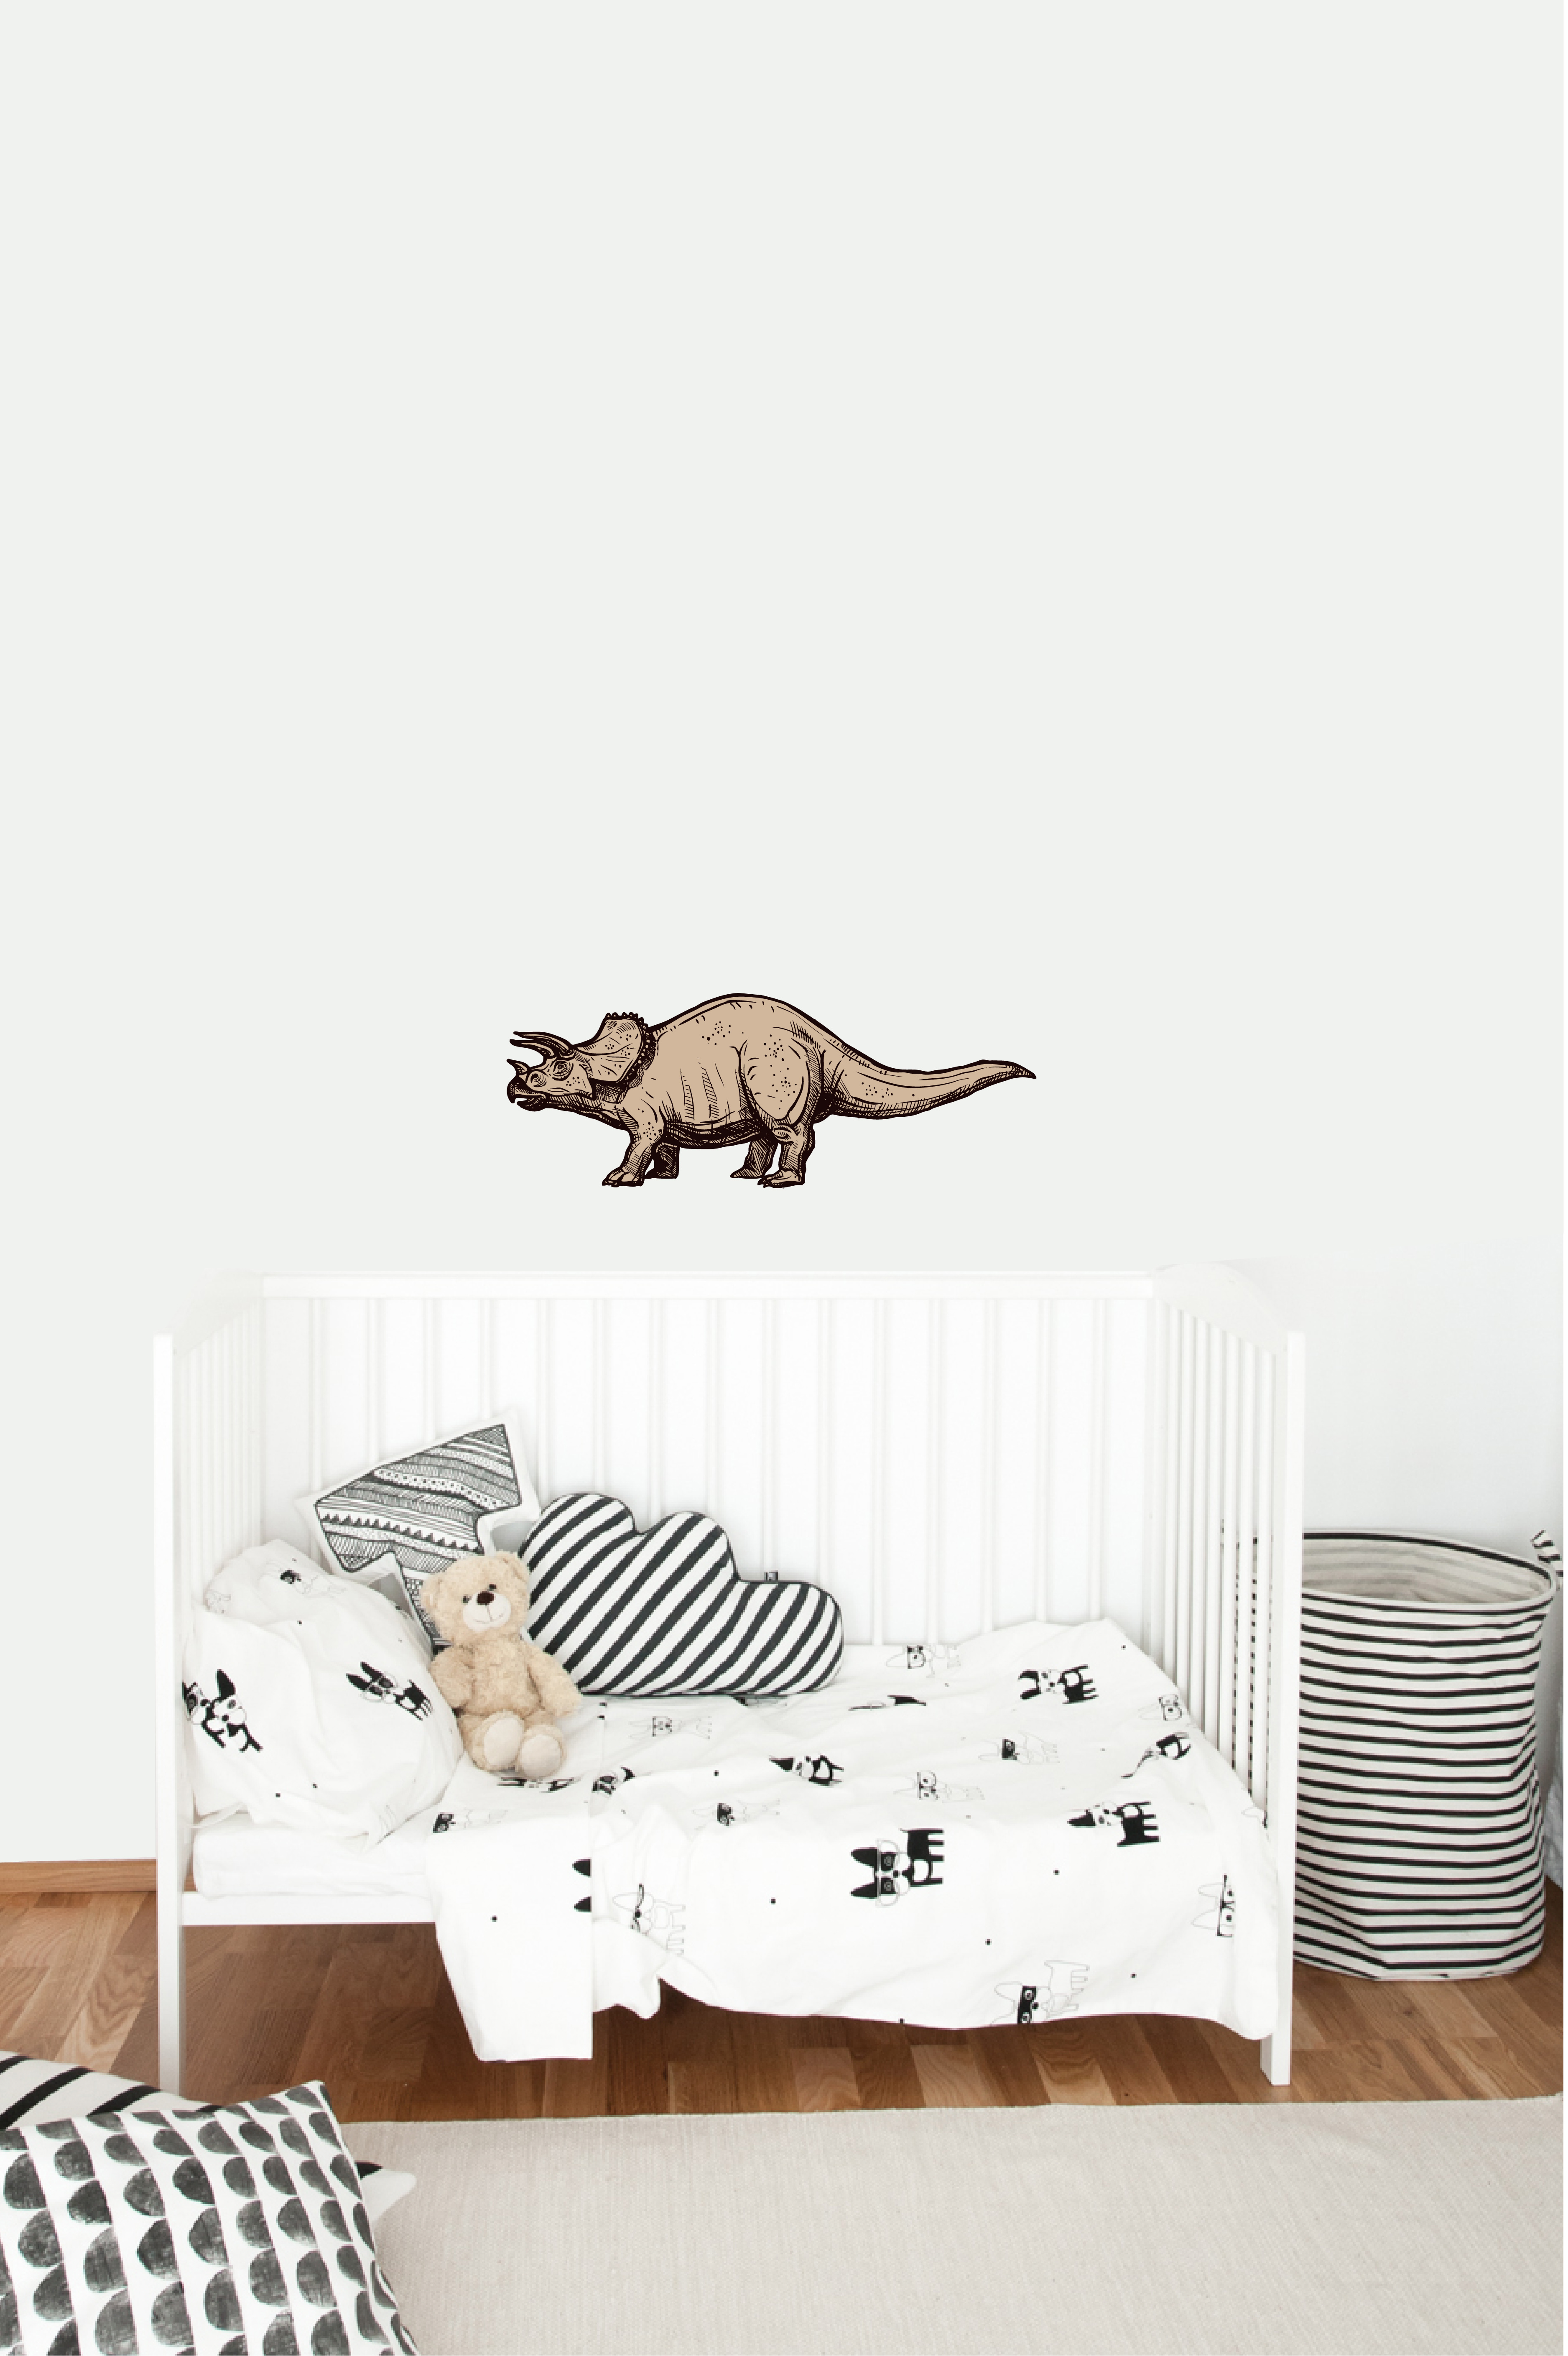 Muursticker triceratops